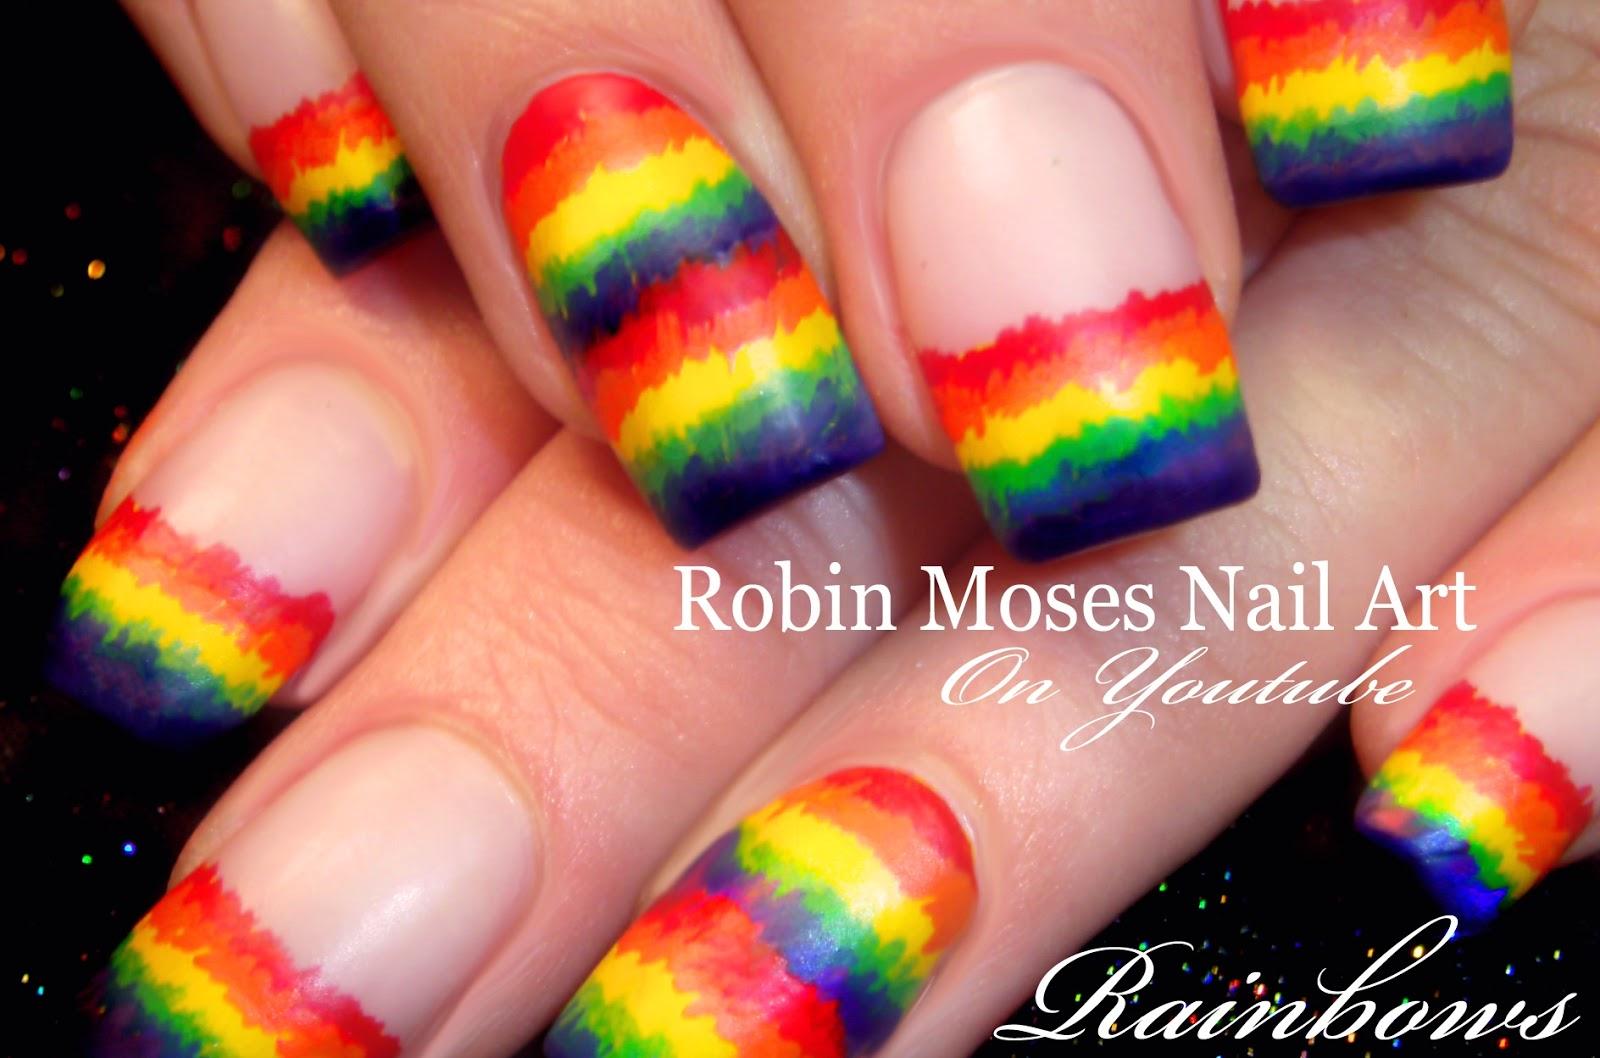 Robin Moses Nail Art: Kocopelli Nails | Southwestern ...